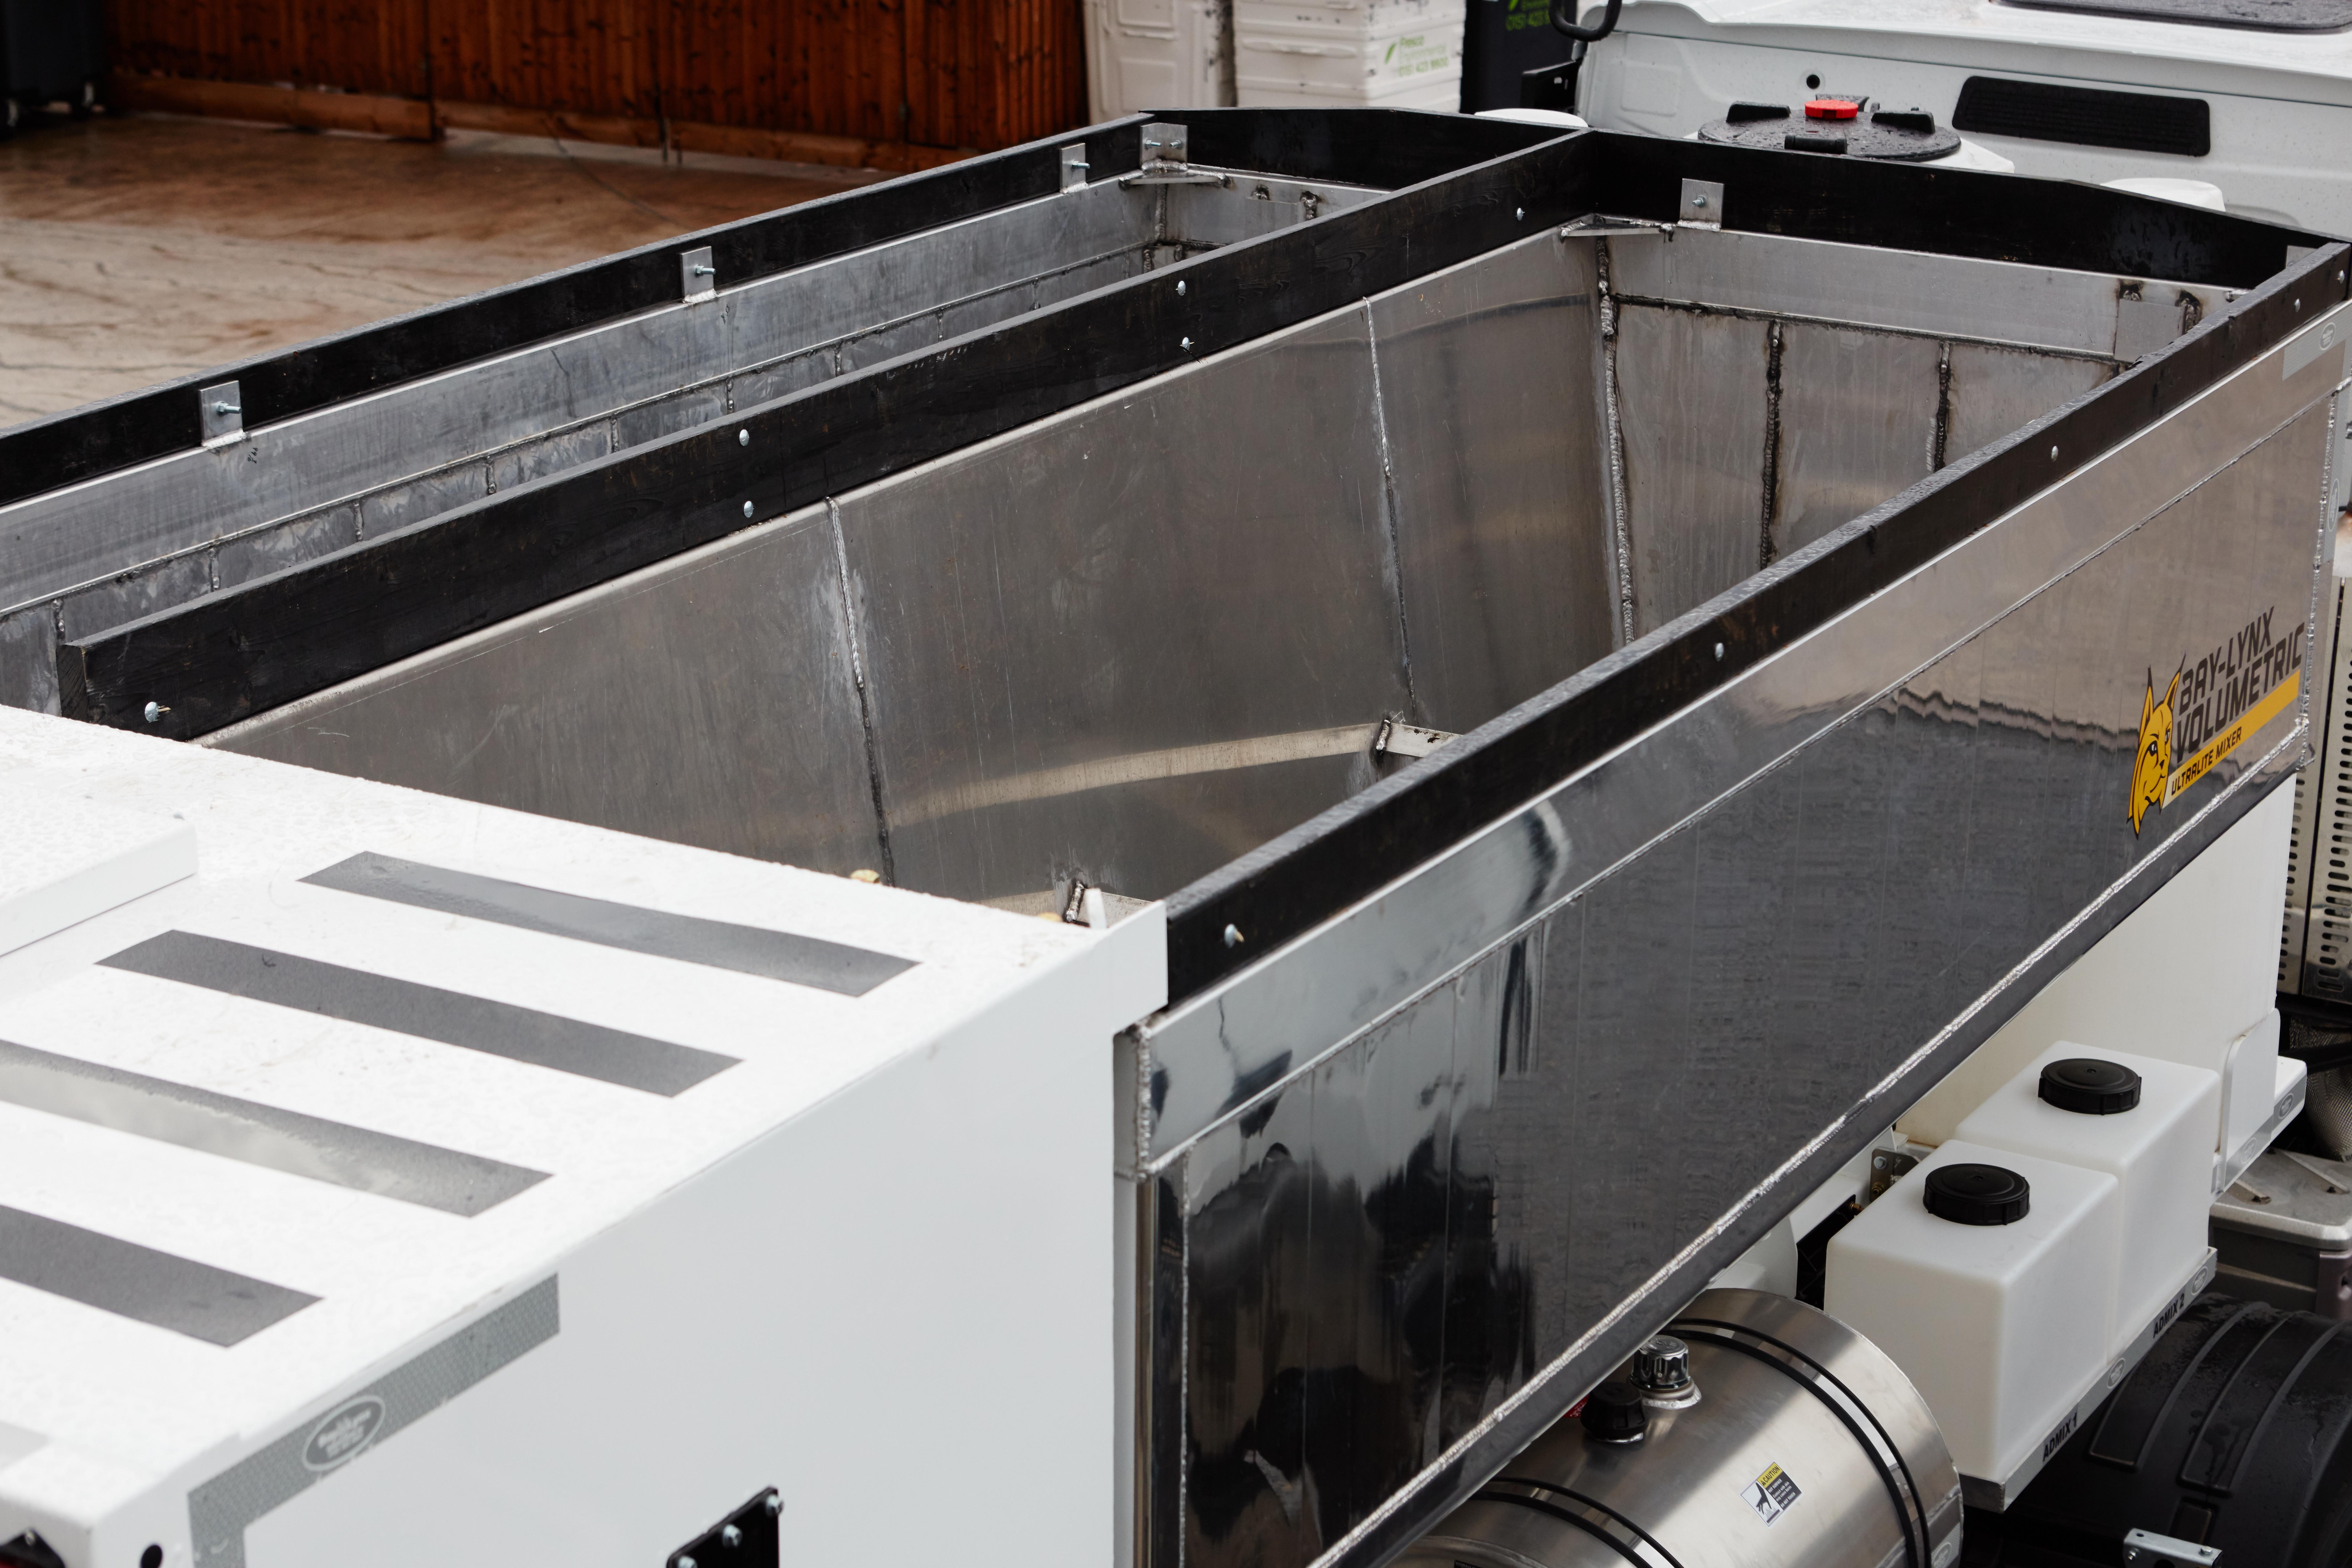 sample all volumetric ultralite lynx mixer inventory truck feeder auger concrete view bay